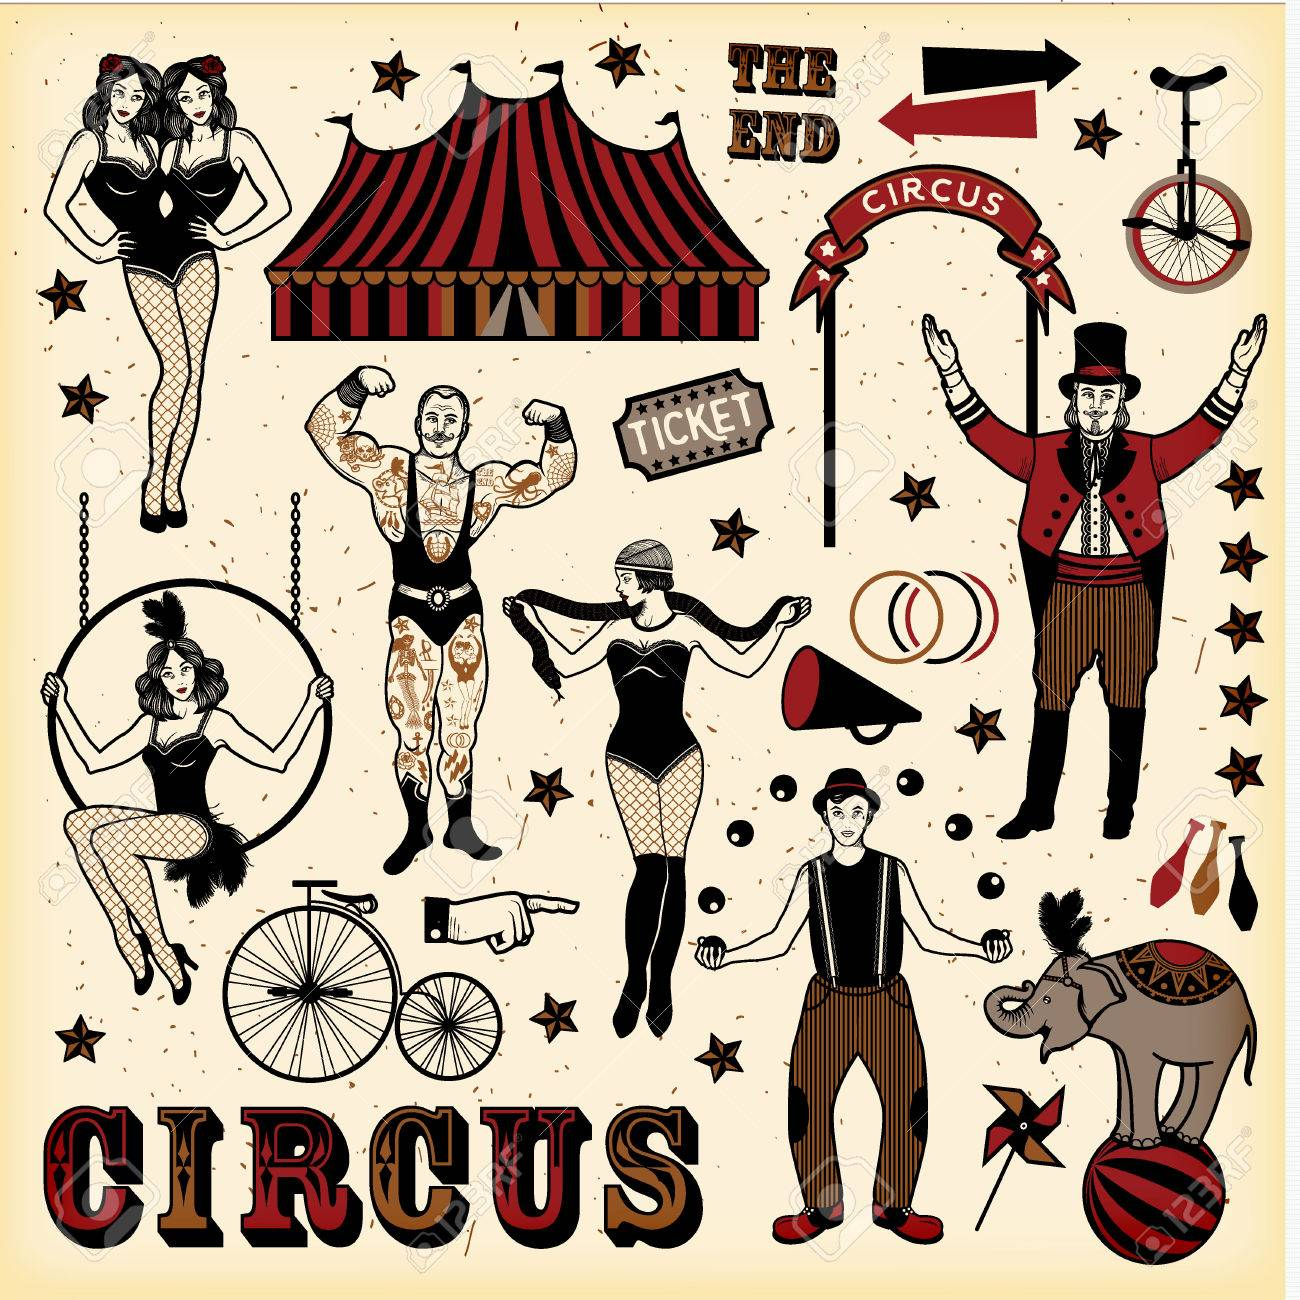 Circus set. Vintage Circus Set. Vector illustration. Illustration of circus stars. - 55295023